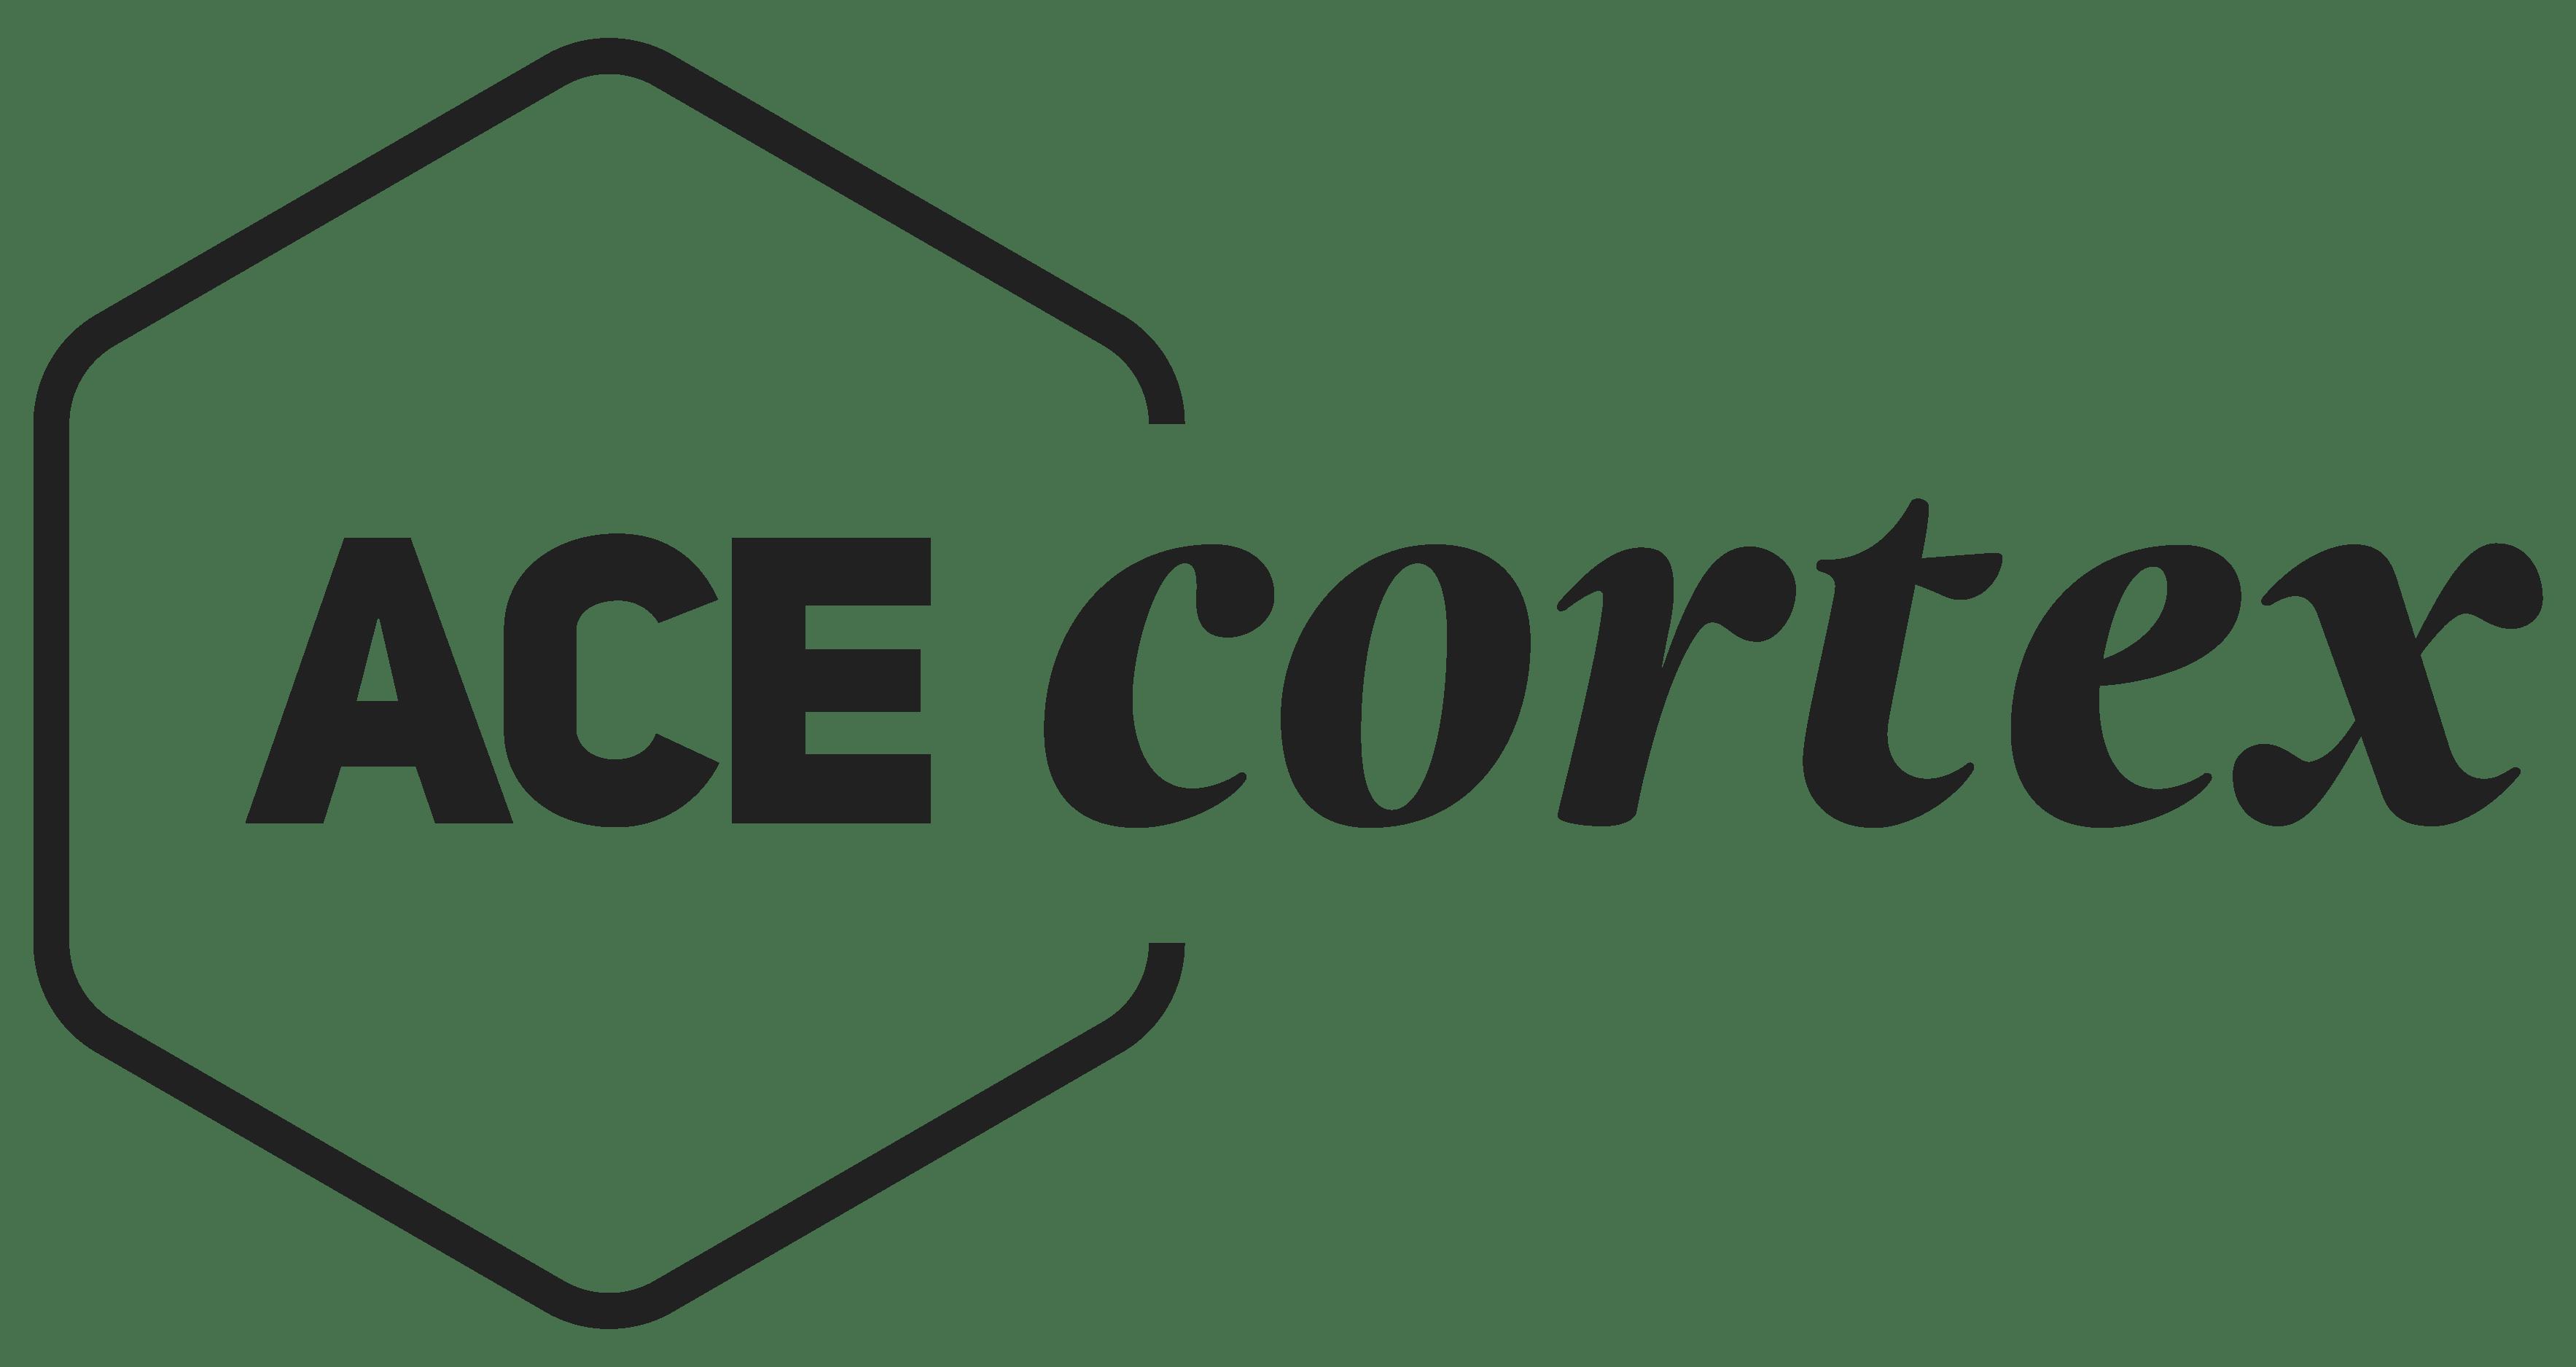 AceCortex_MarcaFinal_FundosClaros